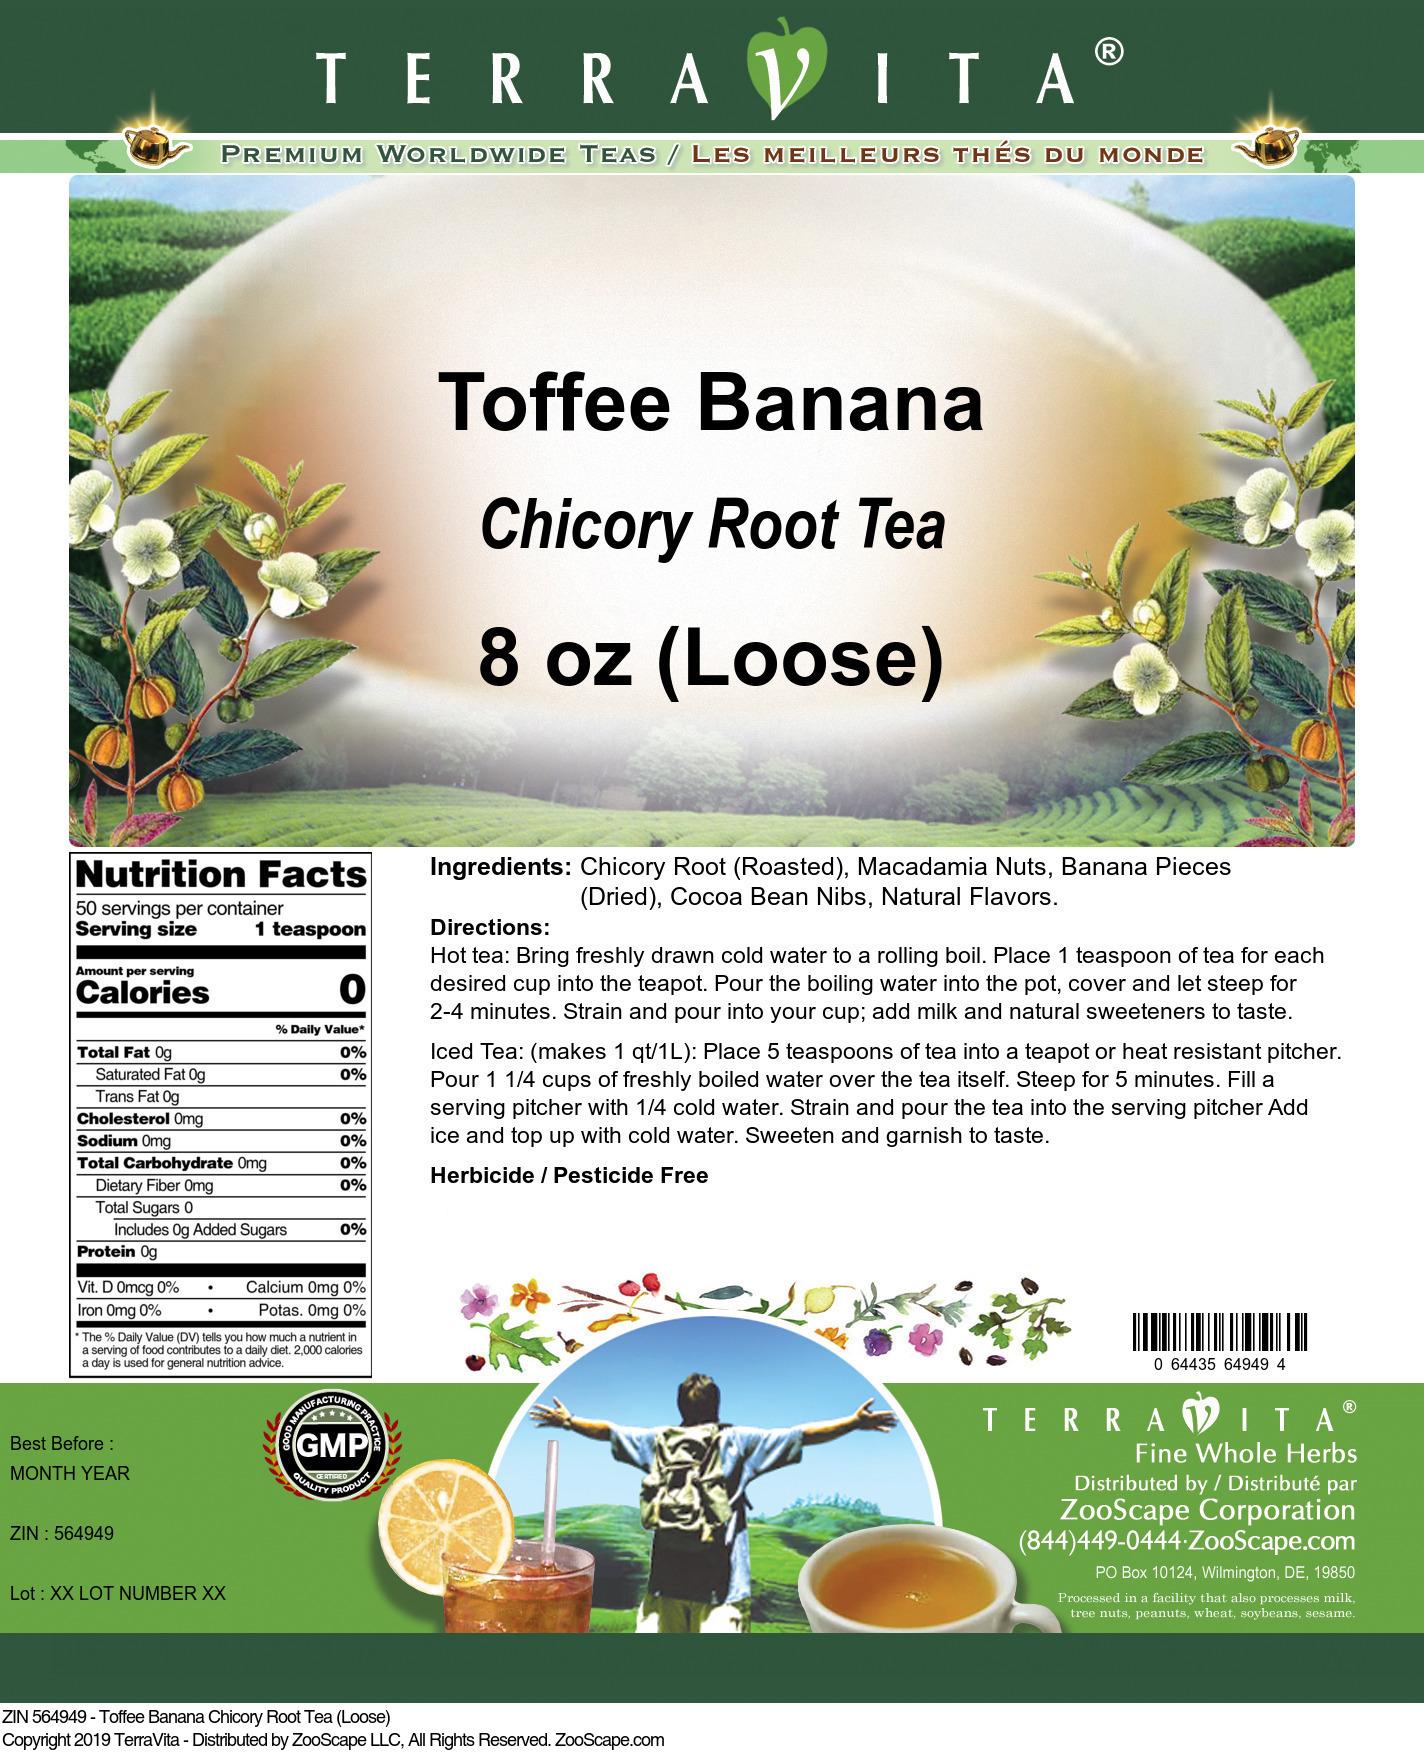 Toffee Banana Chicory Root Tea (Loose)